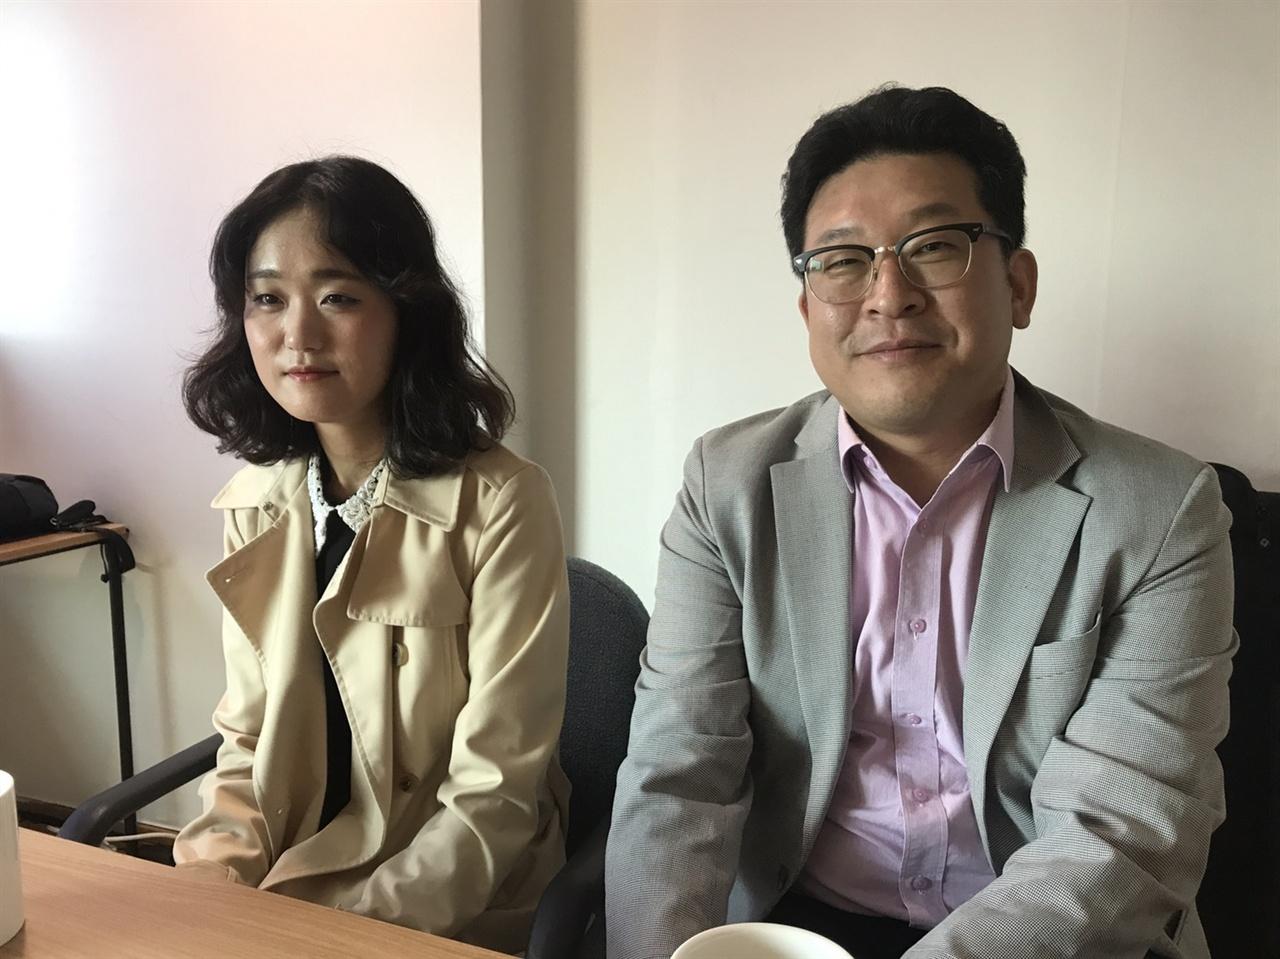 <MBC스페셜> '청춘 생존' 2부작 제작한 박정남(우), 이우리(촤) PD